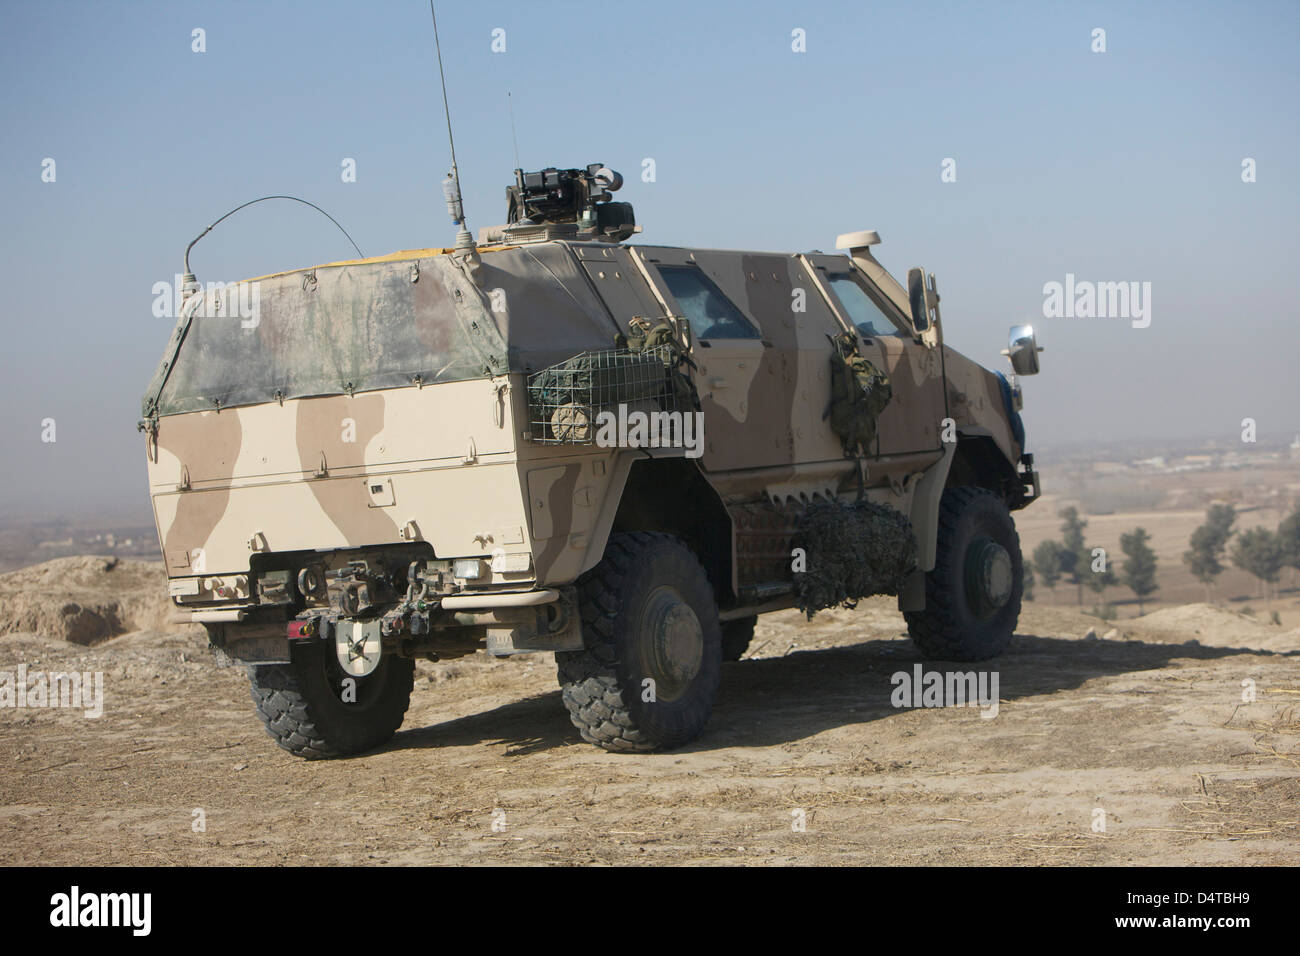 The German Army ATF Dingo armored vehicle. - Stock Image